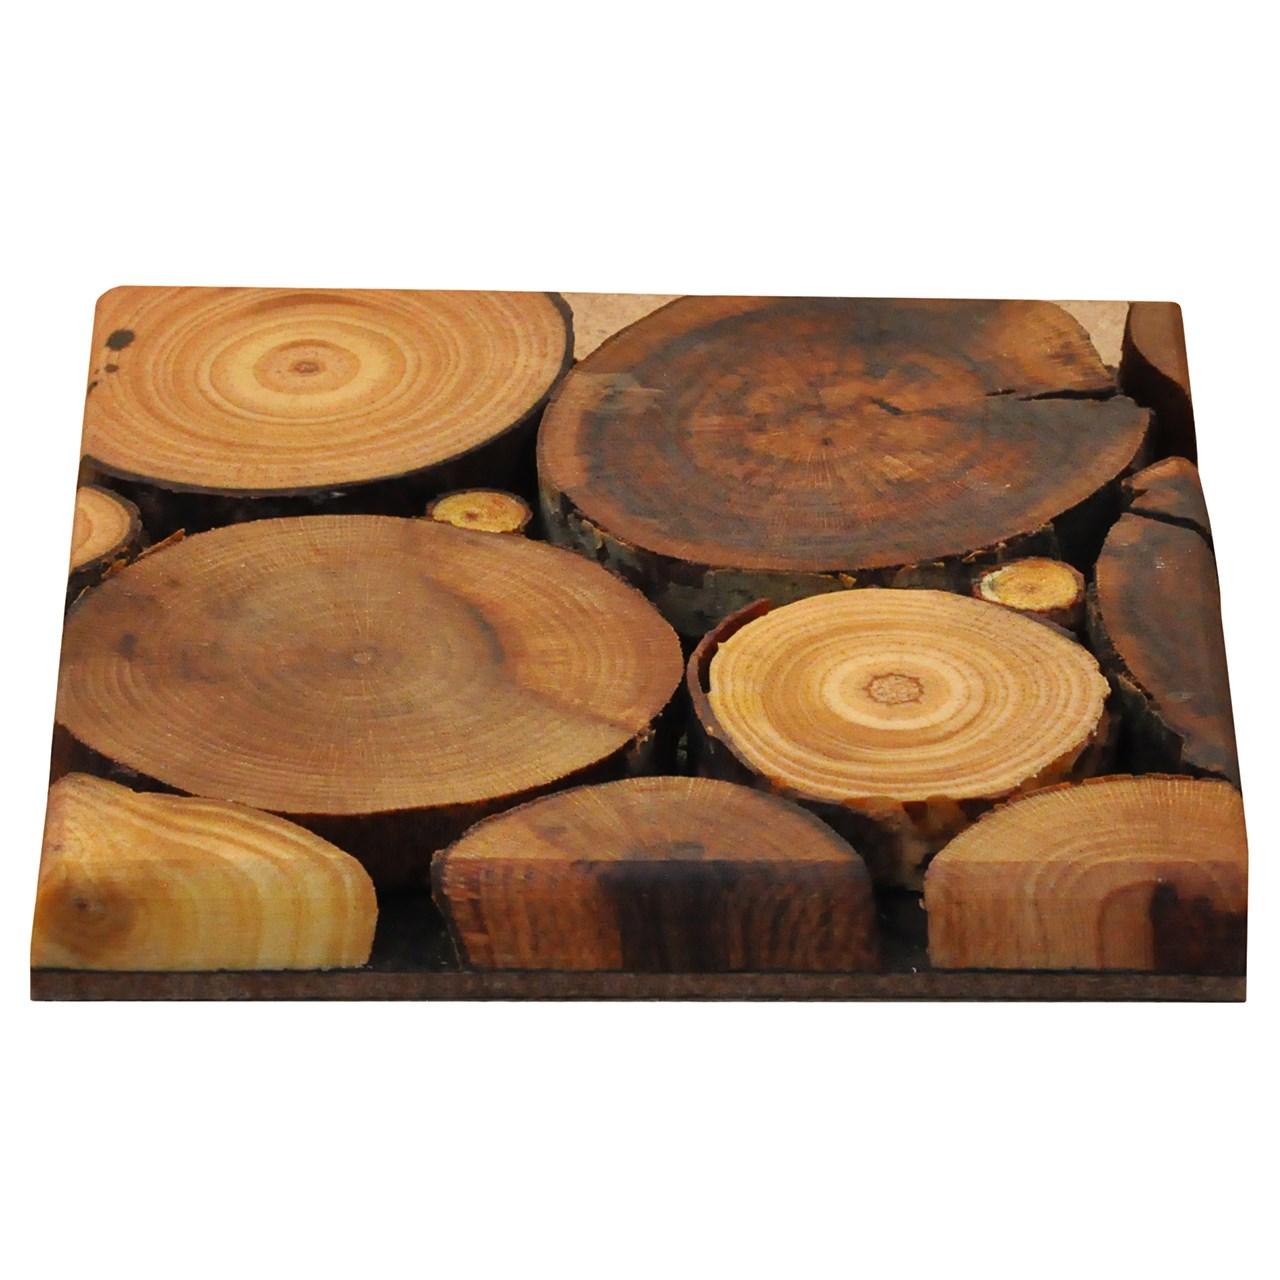 زیرلیوانی چوبی WeWood طرح پازلی مستطیلی